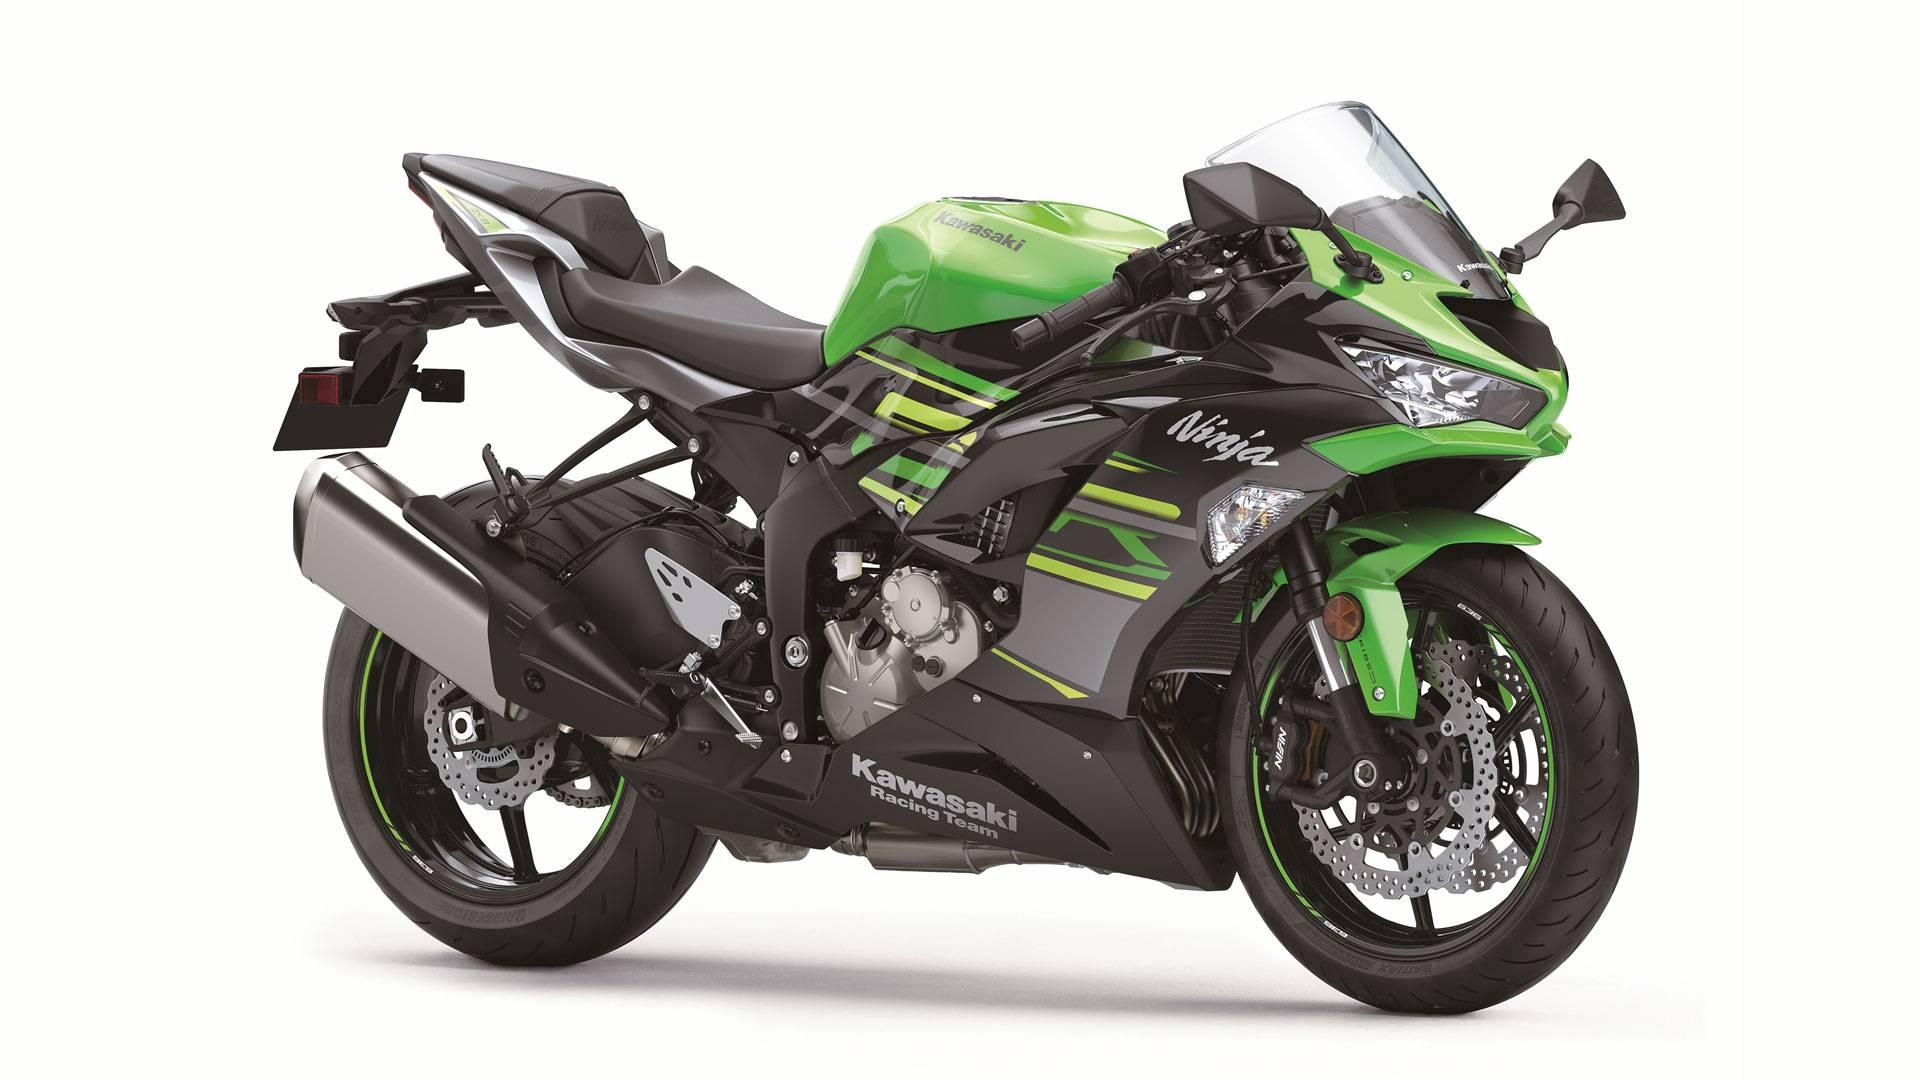 2019 Kawasaki Ninja Zx 6r Launched At Aimexpo Bikesrepublic